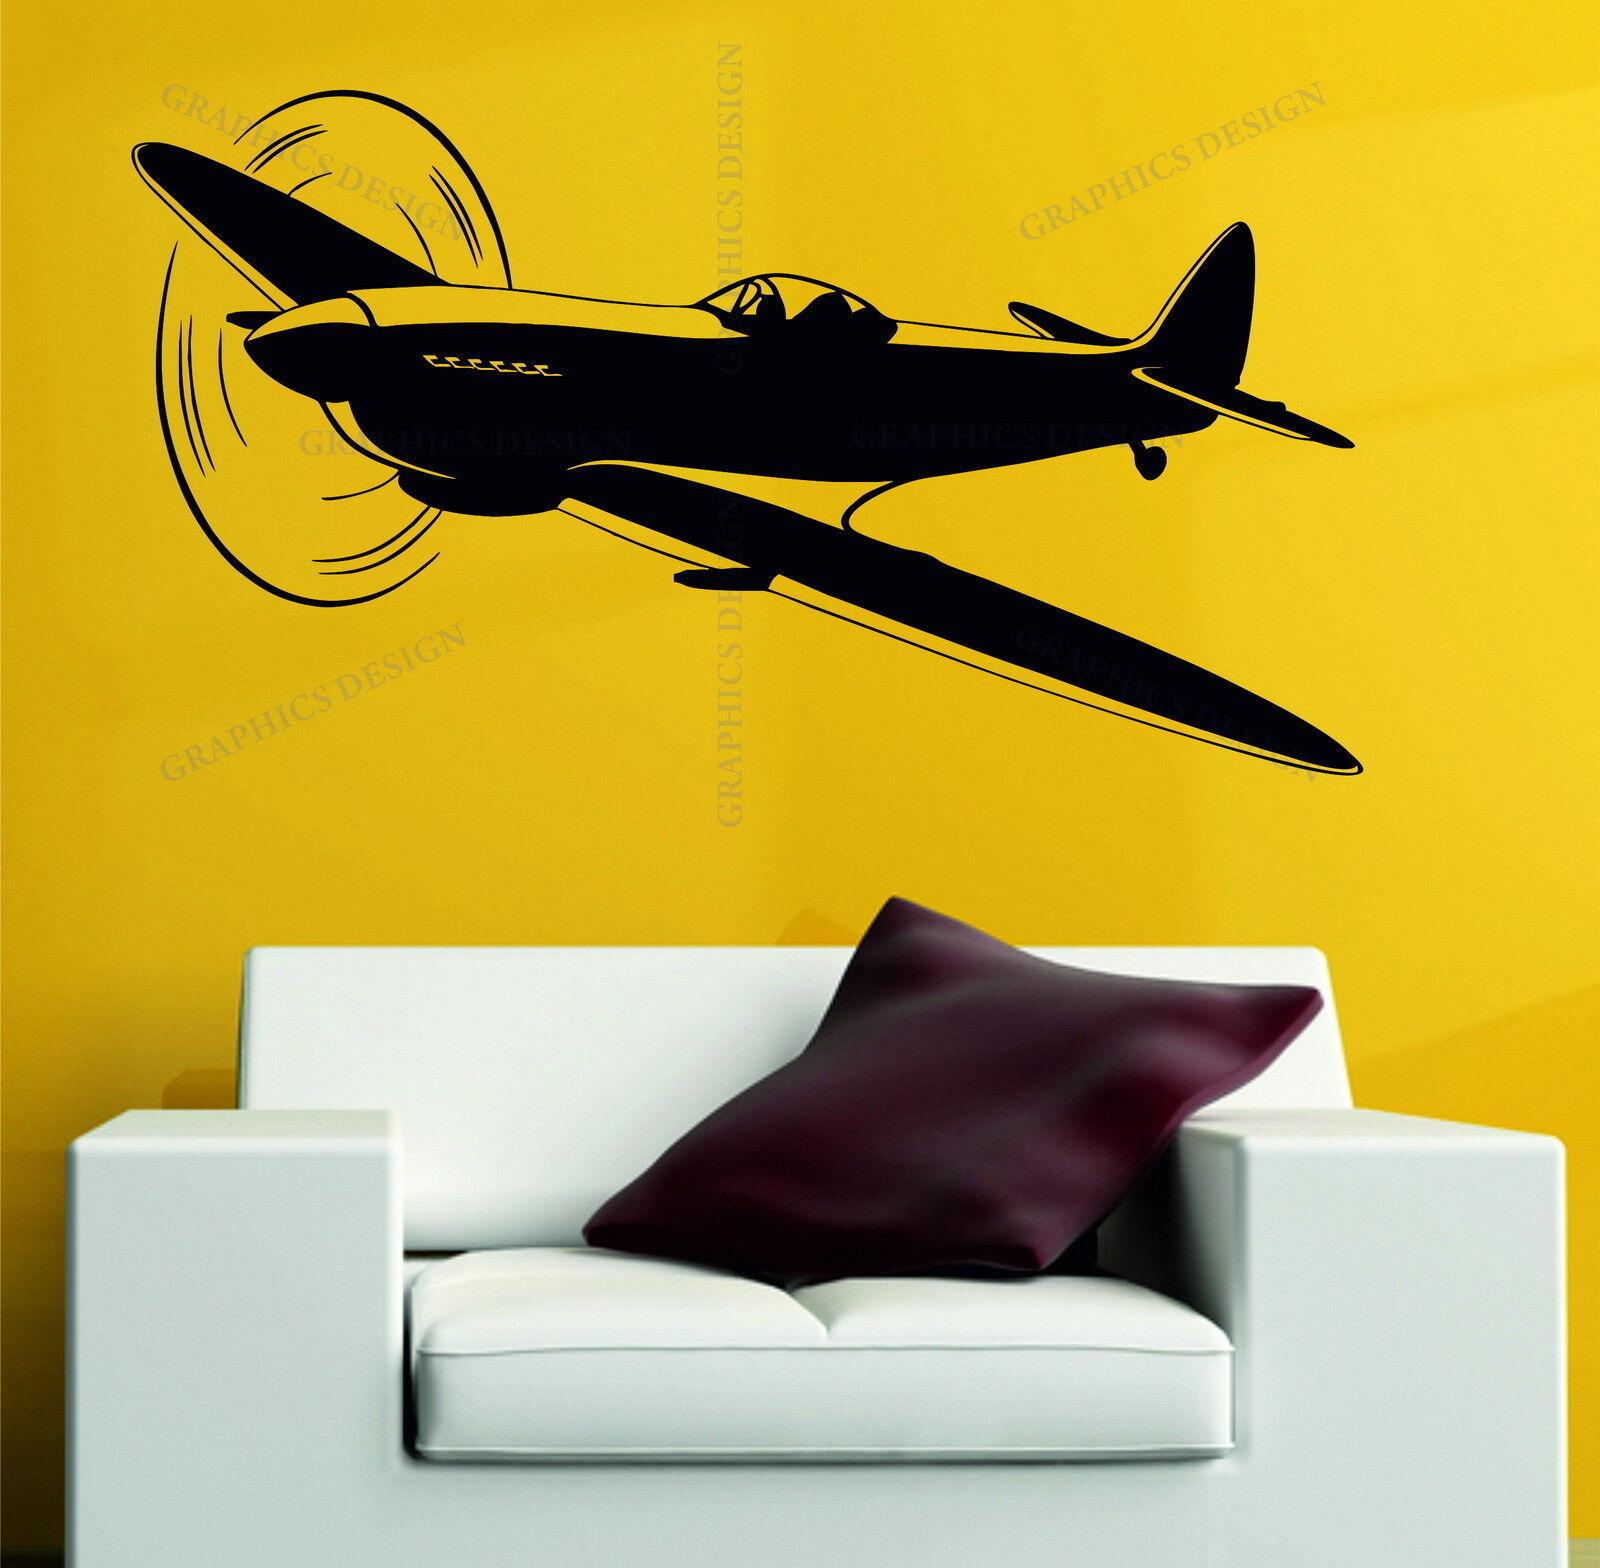 Spitfire Plane Army Ww2 Raf Airplane Decor Vinyl Wall